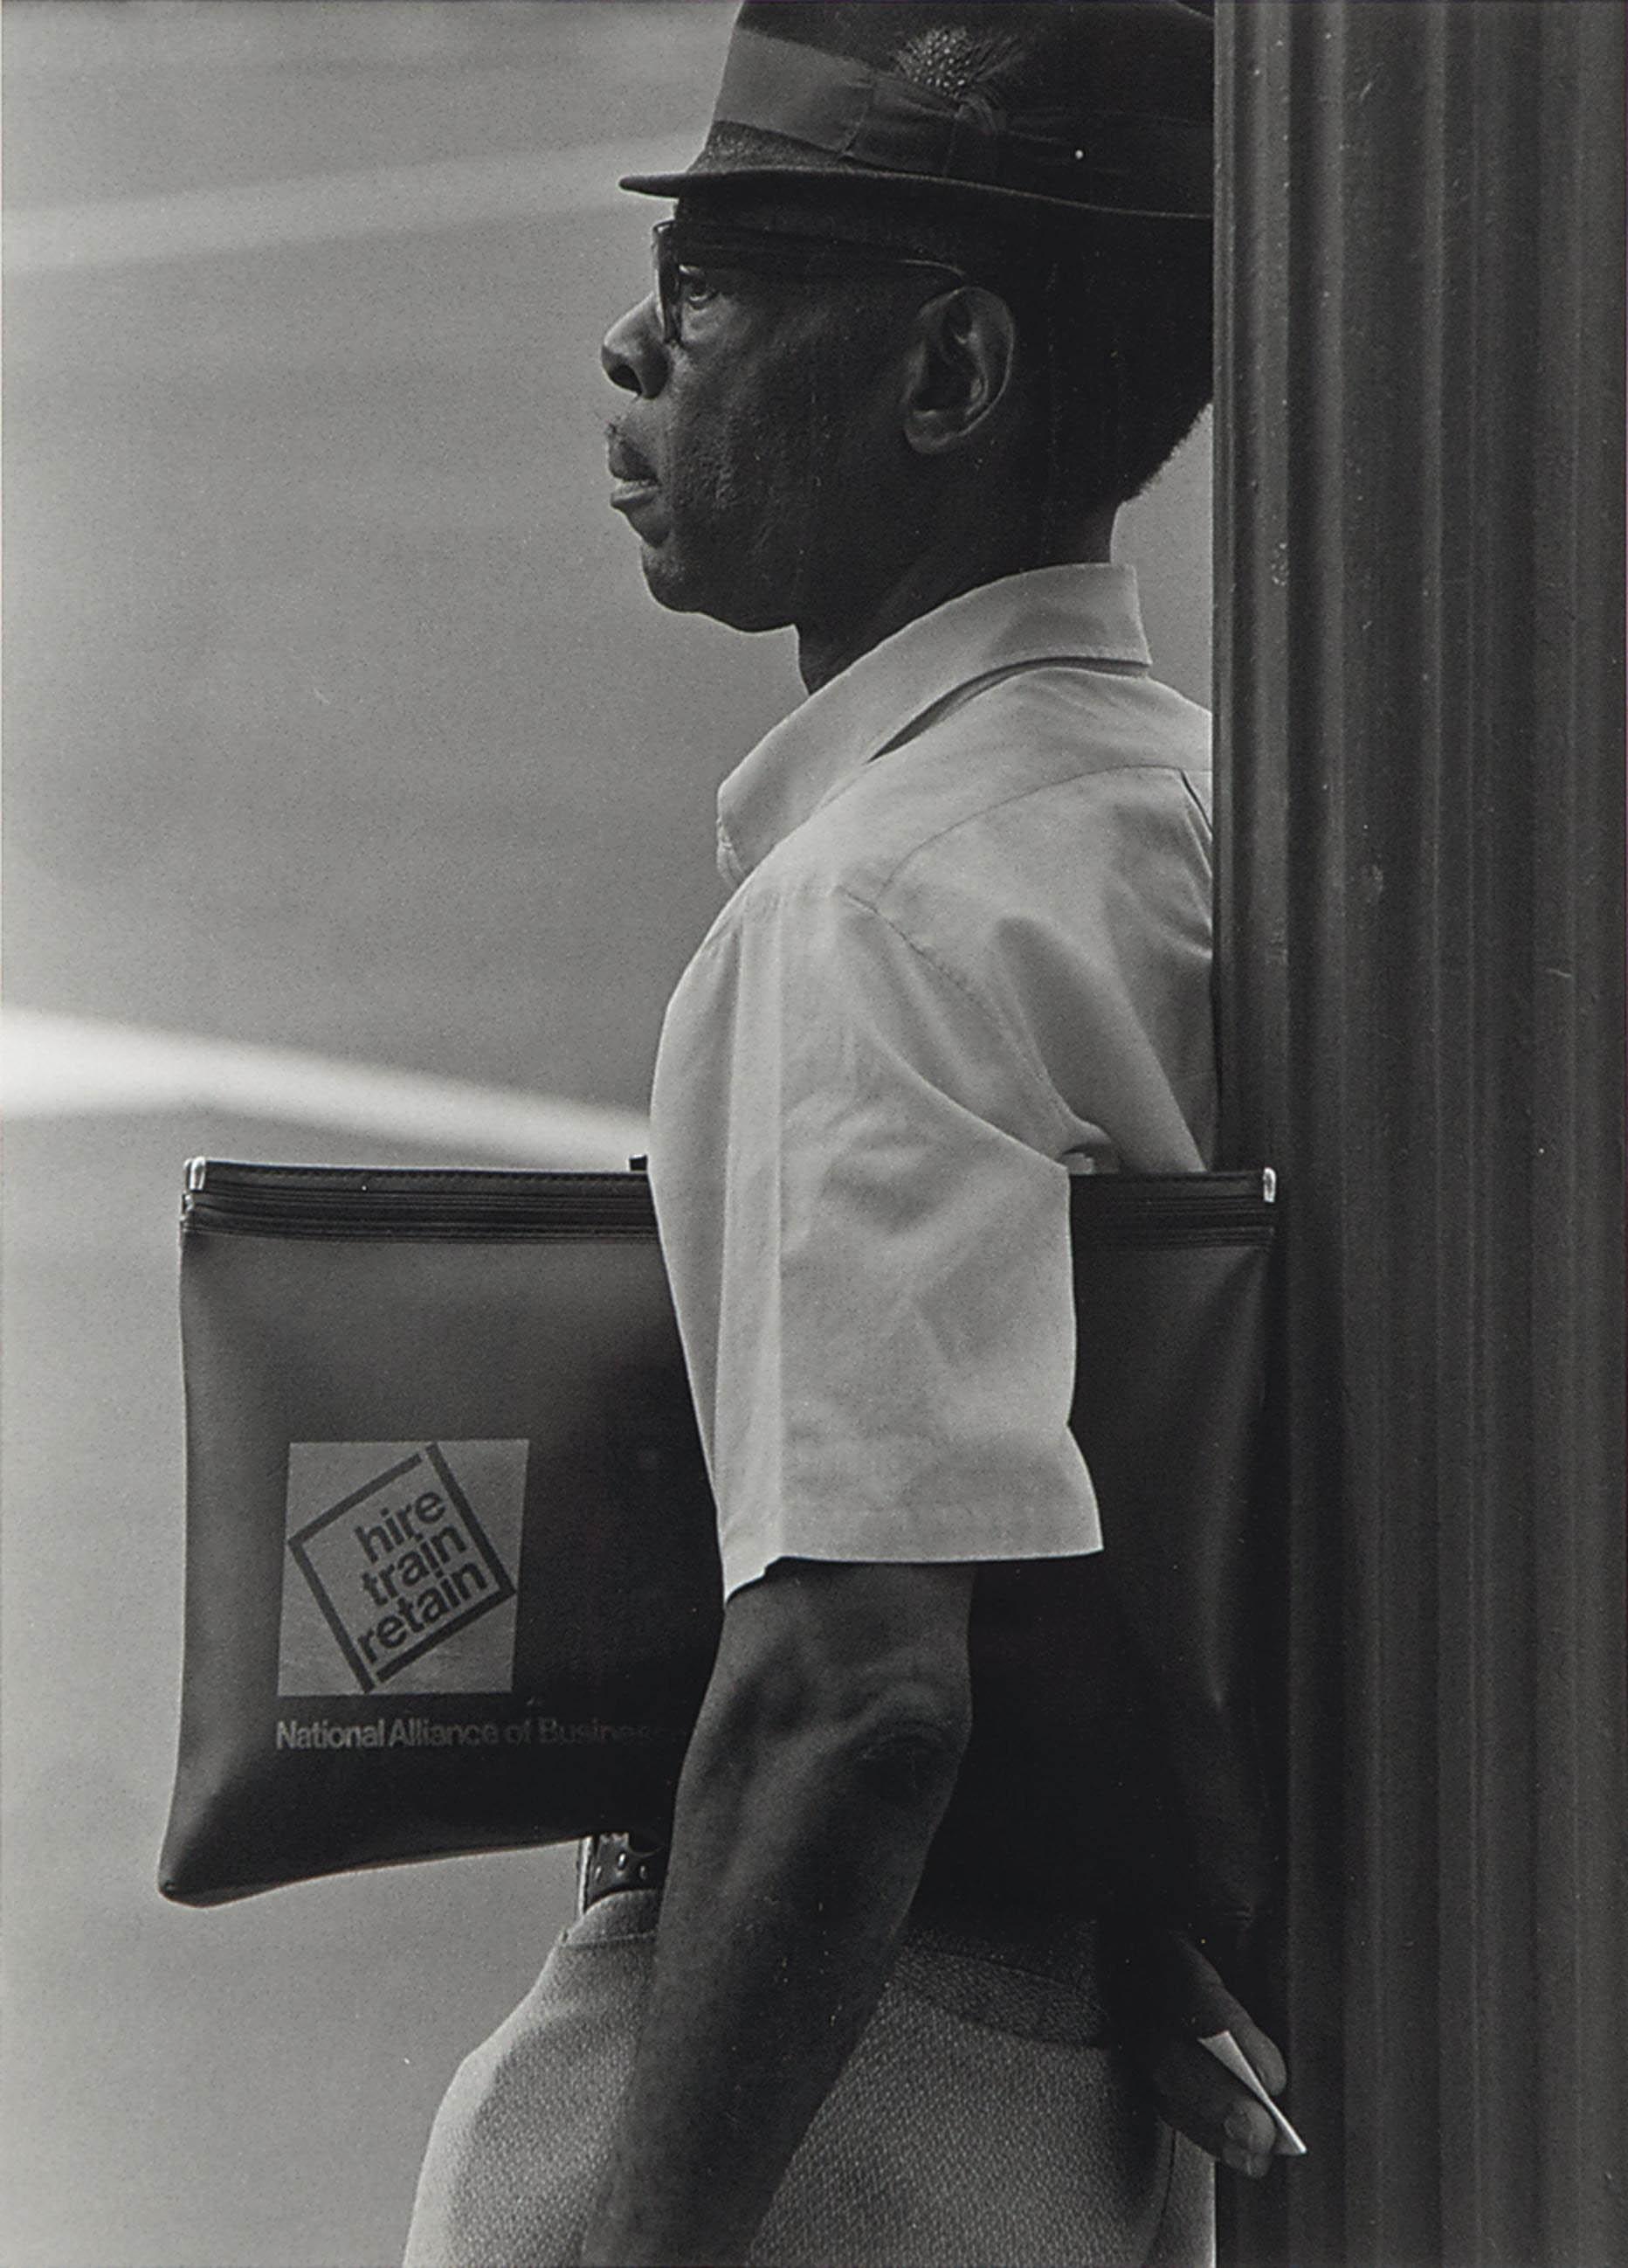 Untitled (Man with portfolio)